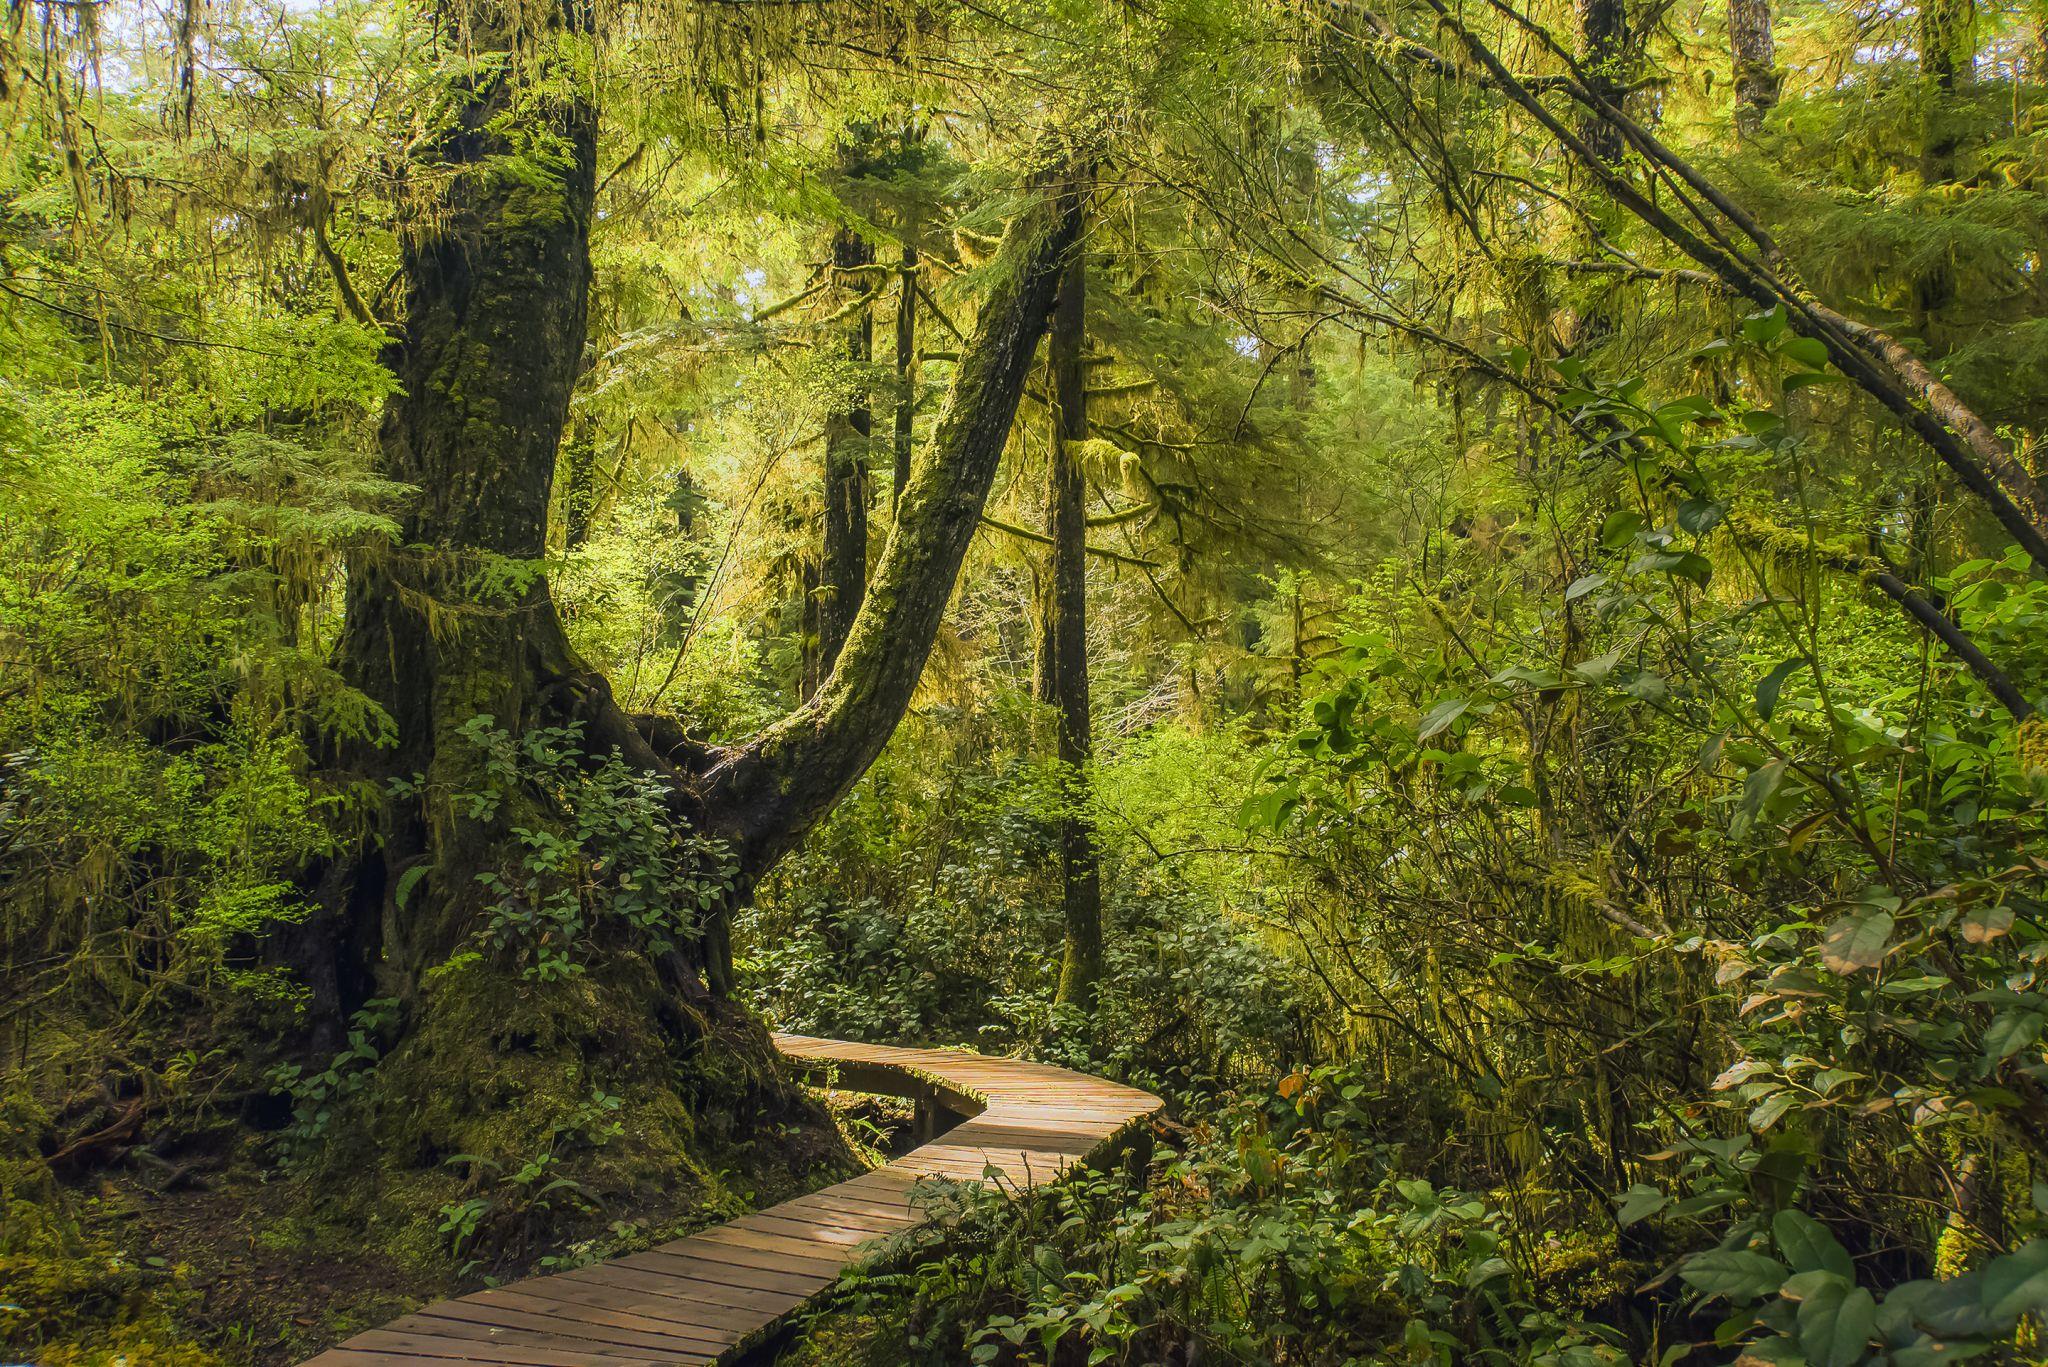 Boardwalk Trail to Schooner Bay, Canada